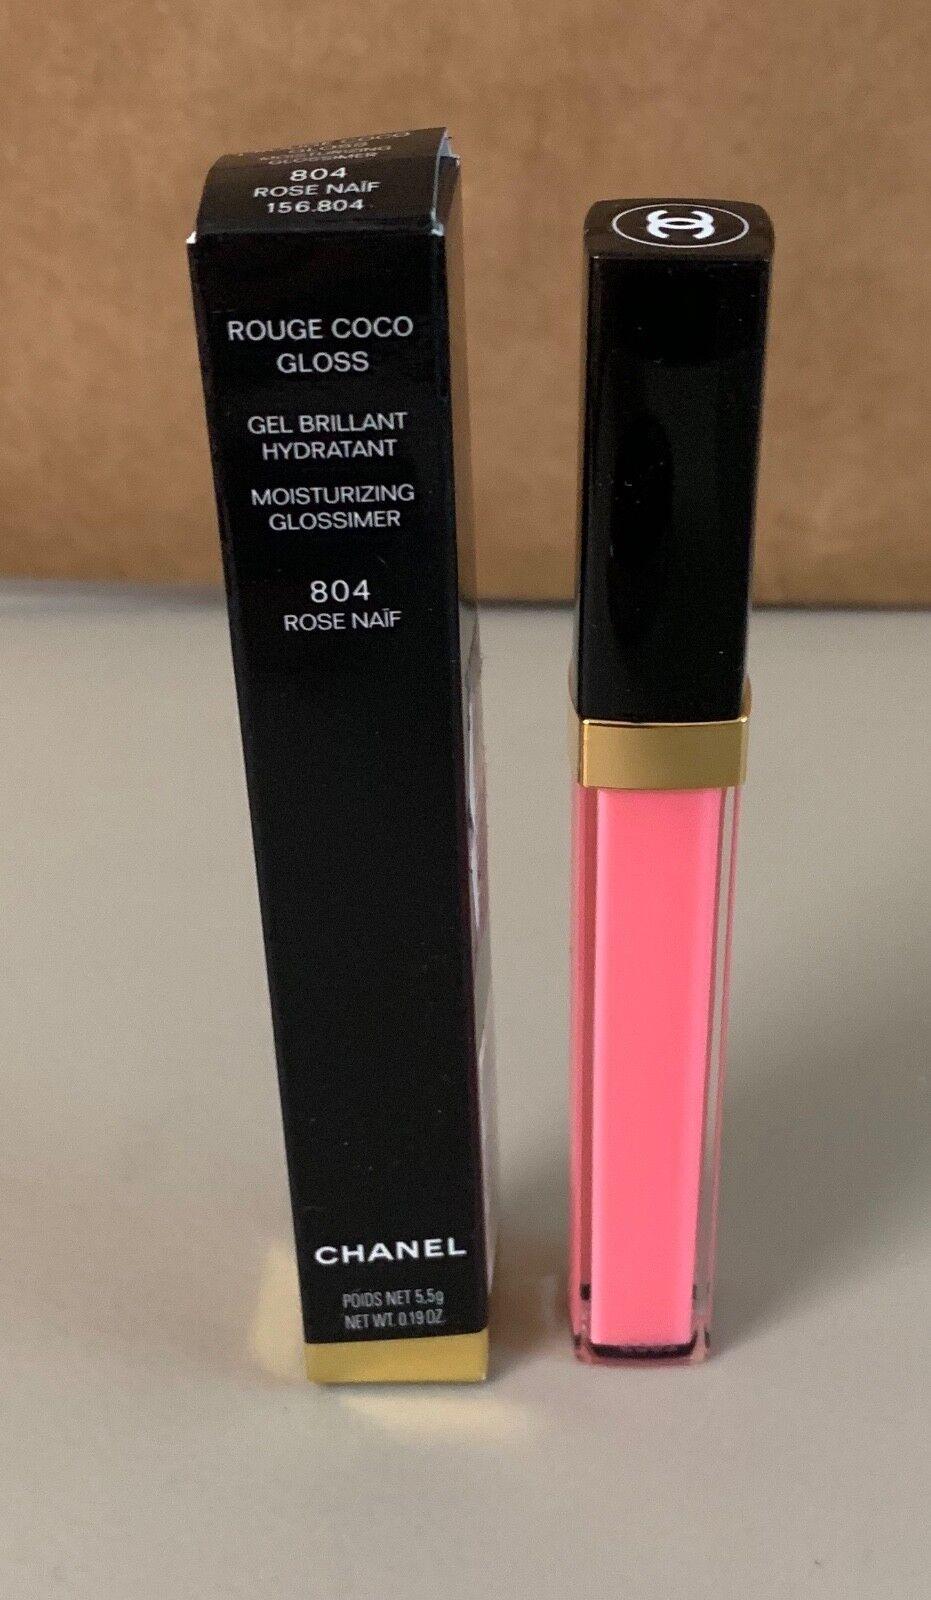 e08bd43bcb CHANEL Rouge Coco Gloss Moisturizing Glossimer 804 Rose Naif Full Size